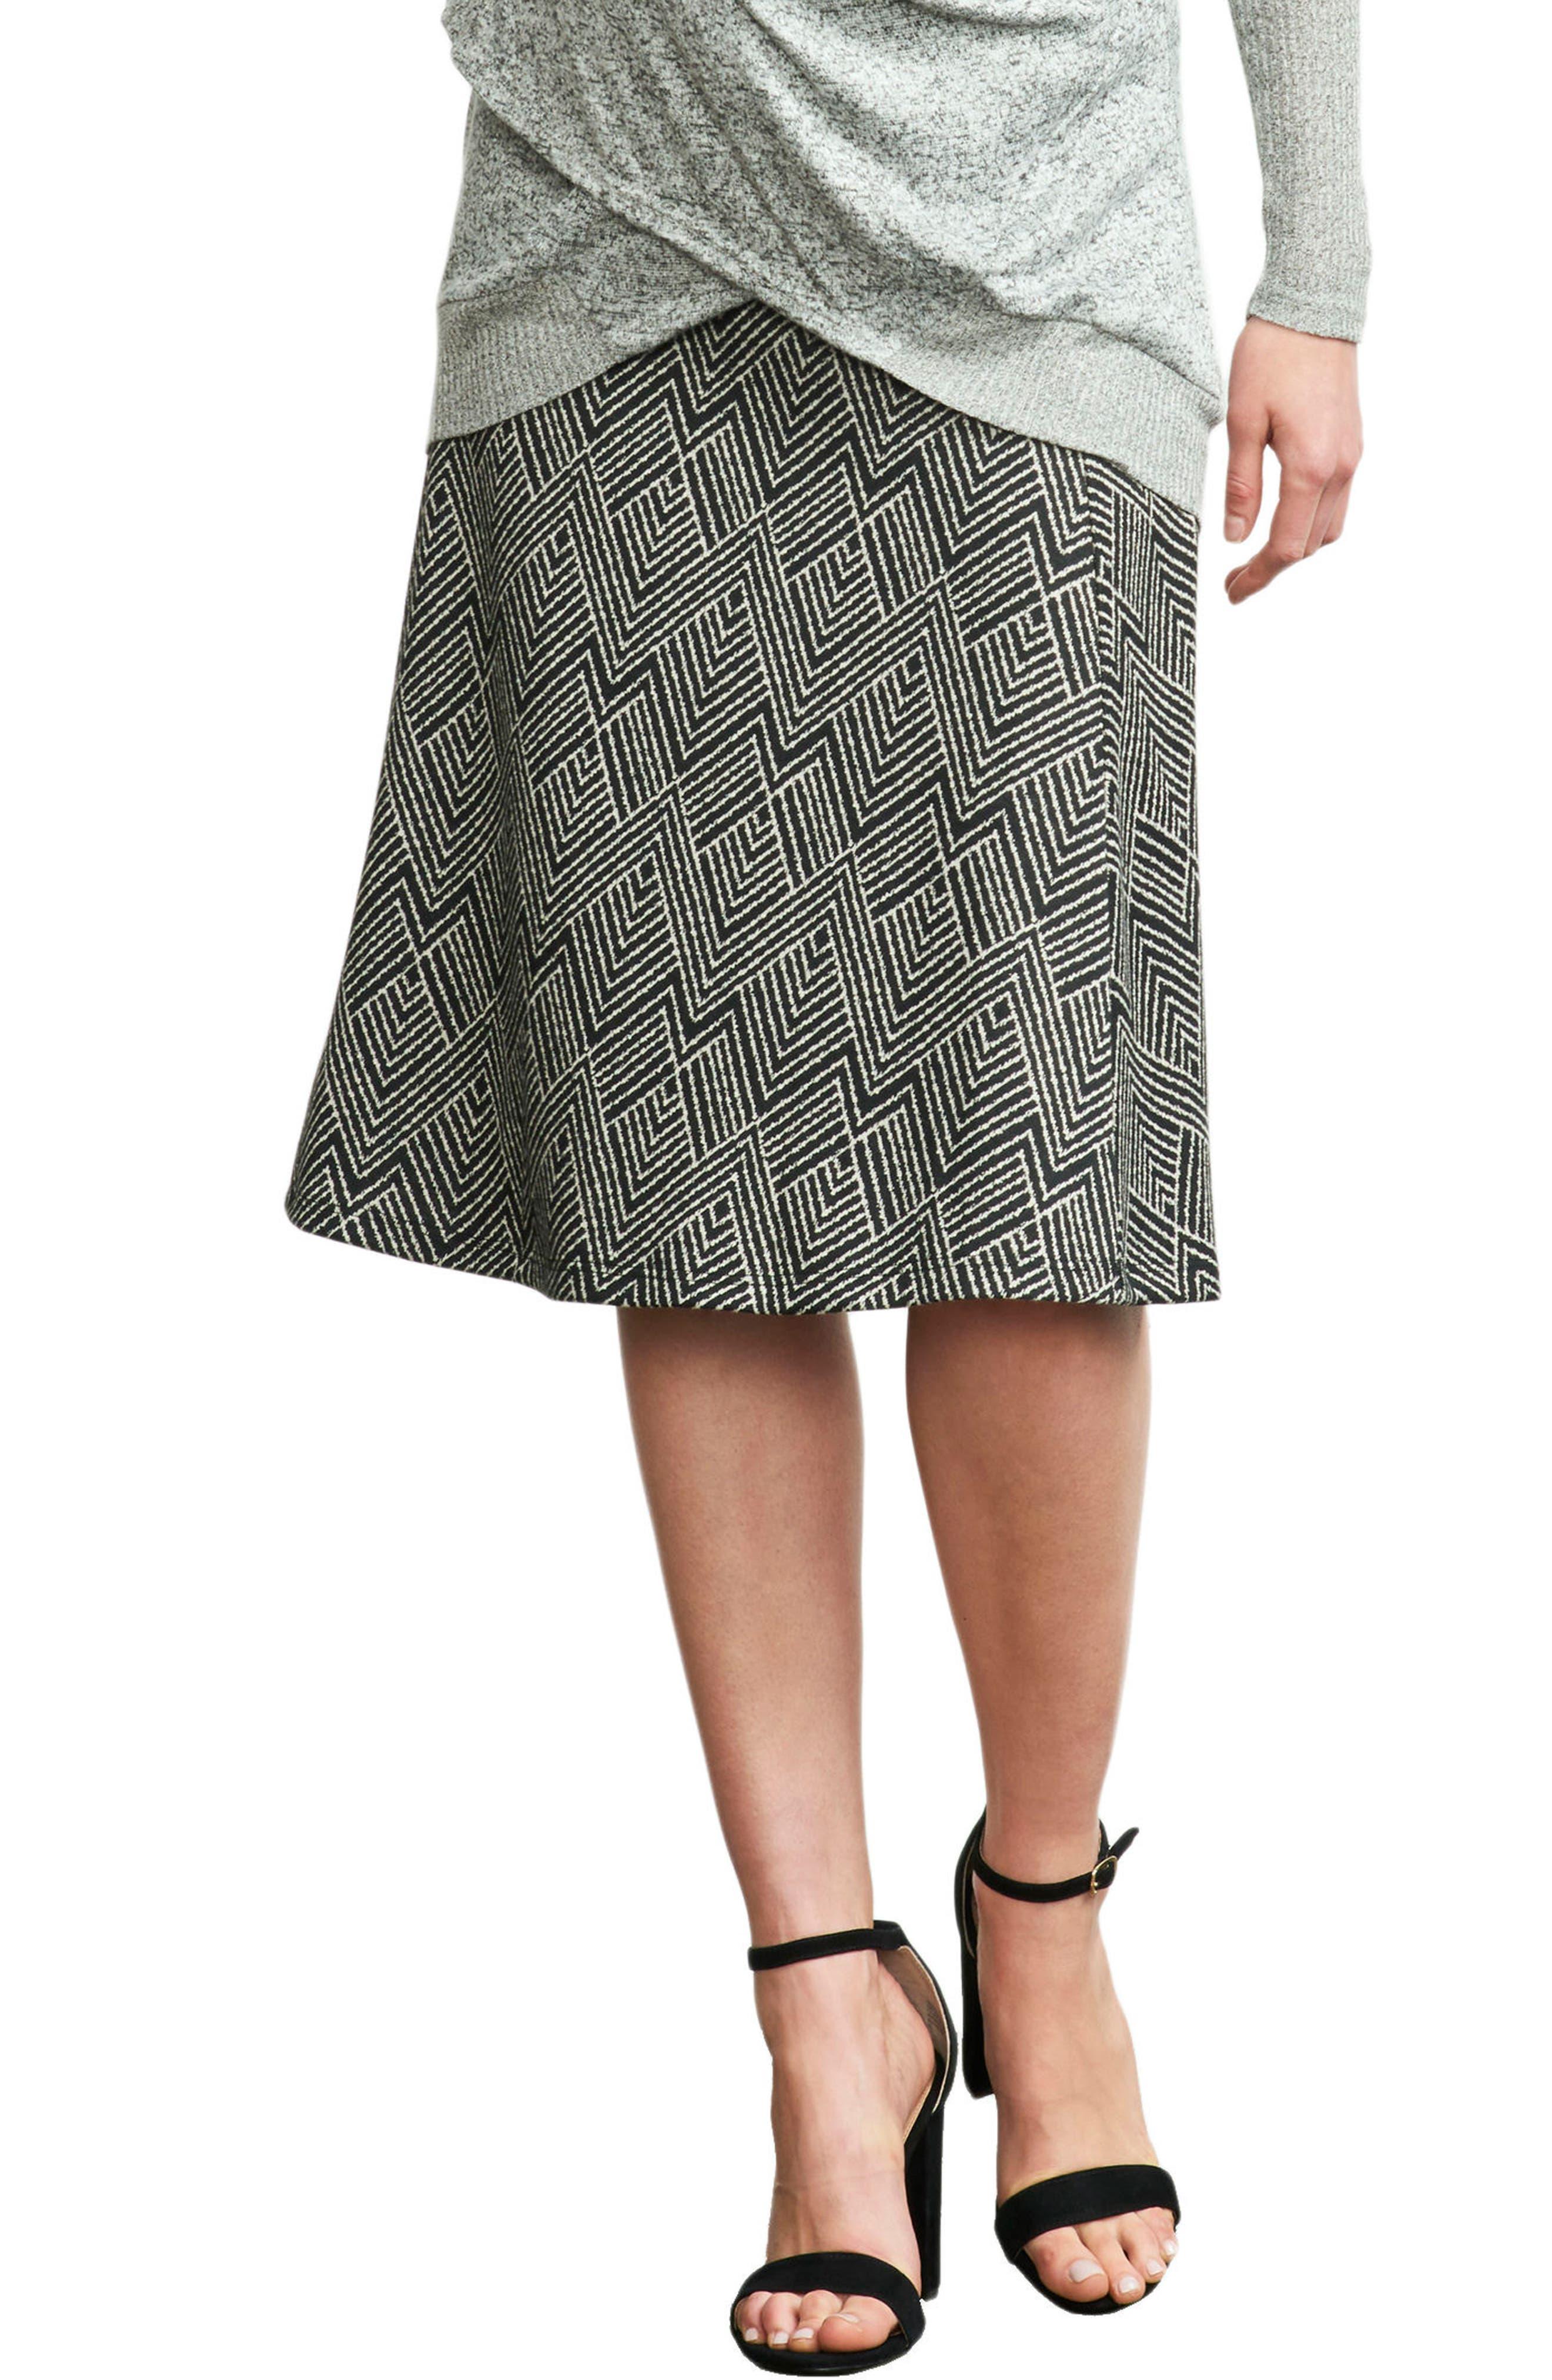 Maternal America Print A-Line Maternity Skirt, Ivory